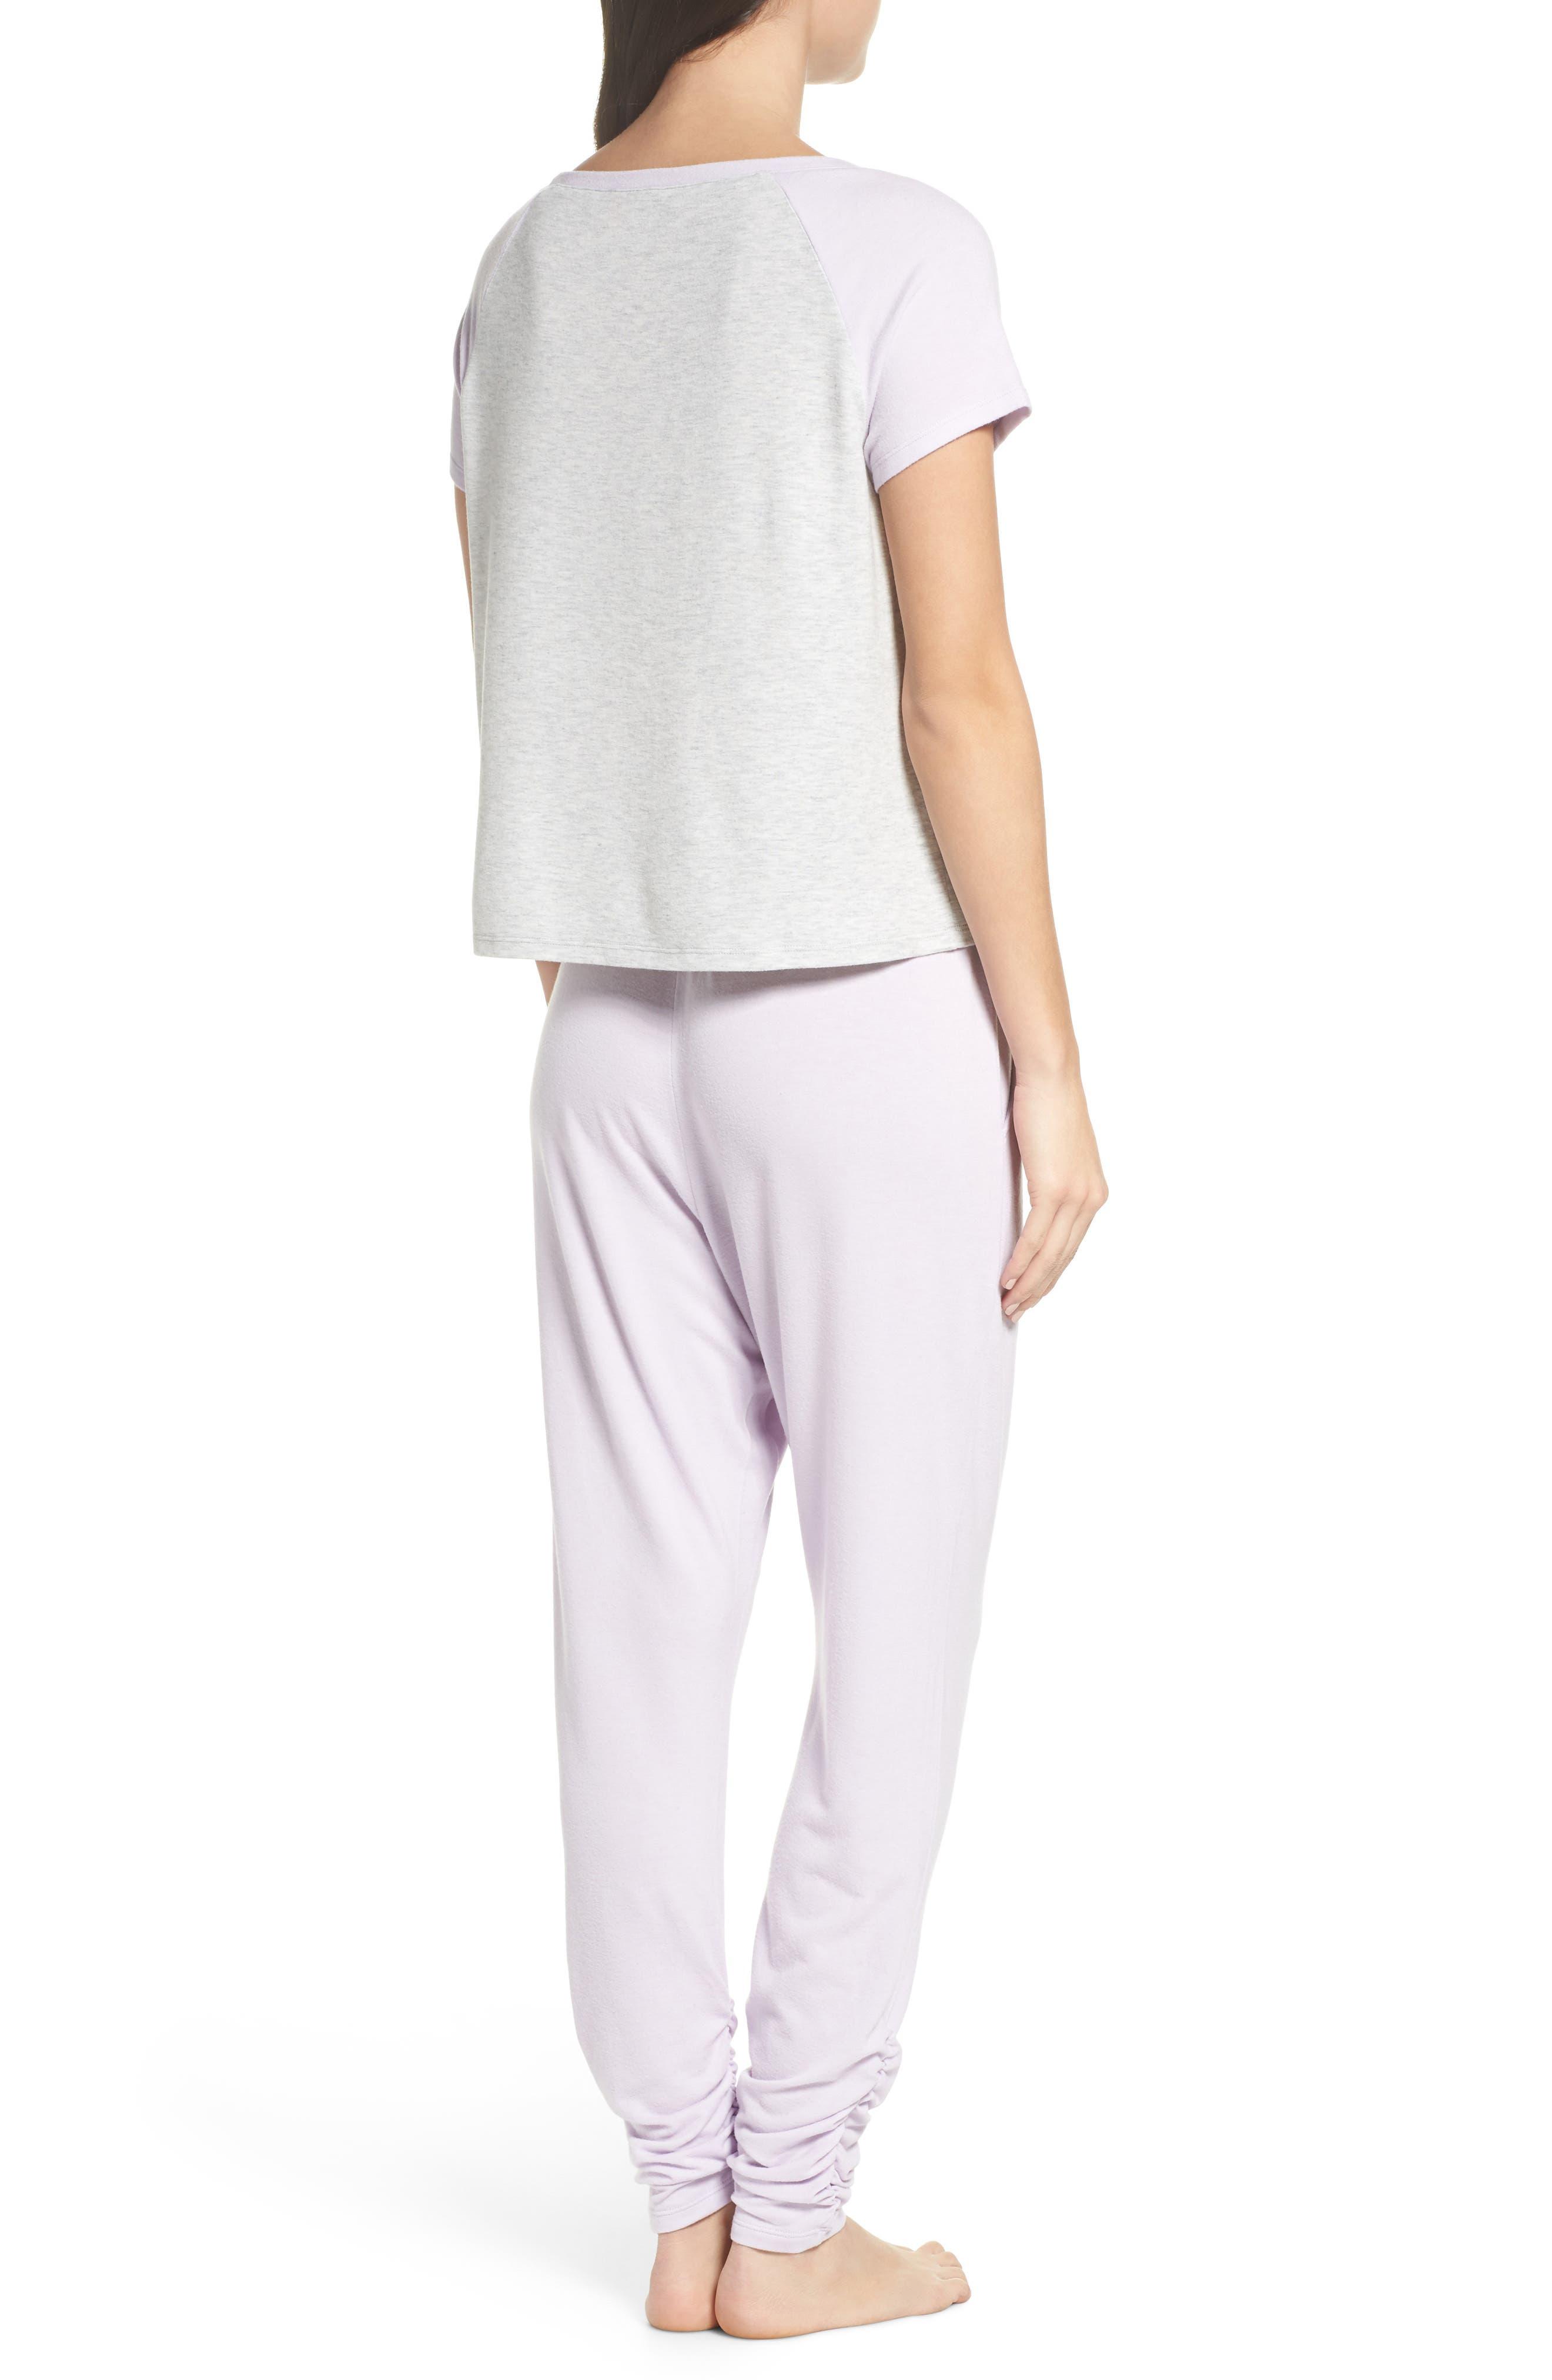 Cloud 9 Pajamas,                             Alternate thumbnail 2, color,                             050